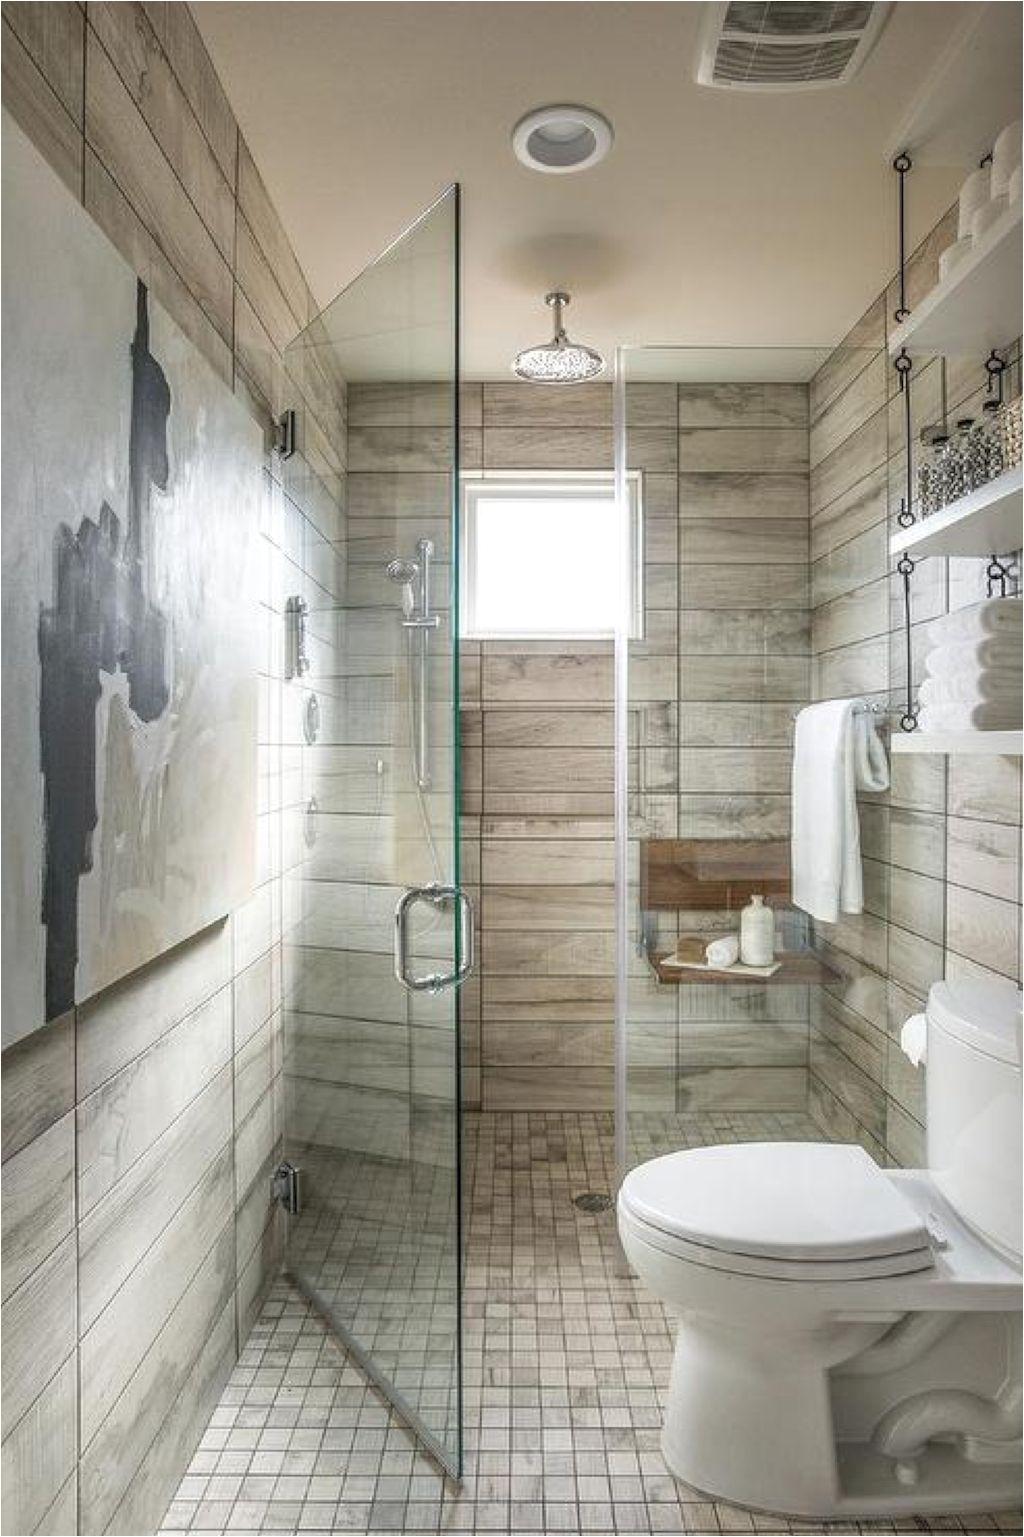 Adorable 58 Cottage Bathroom Design Ideas cottage bathroom design ideas